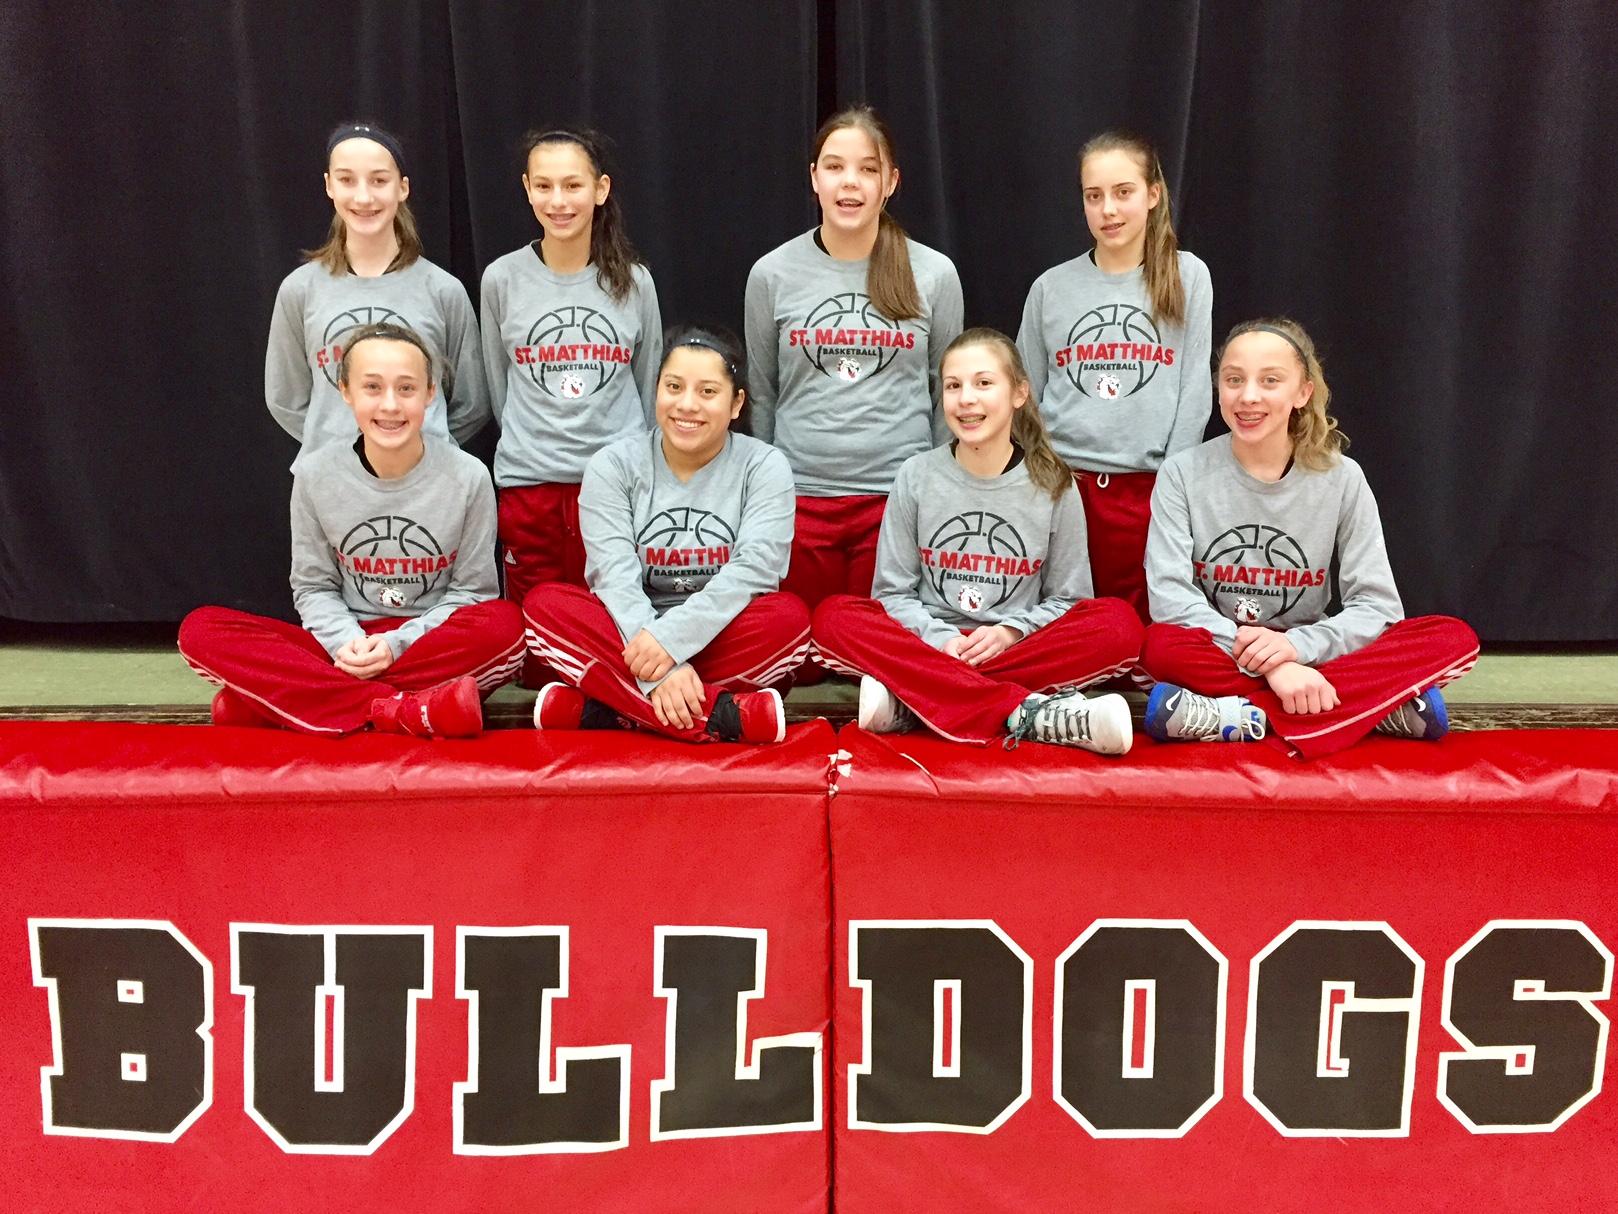 The 2017 St. Matthias Bulldogs